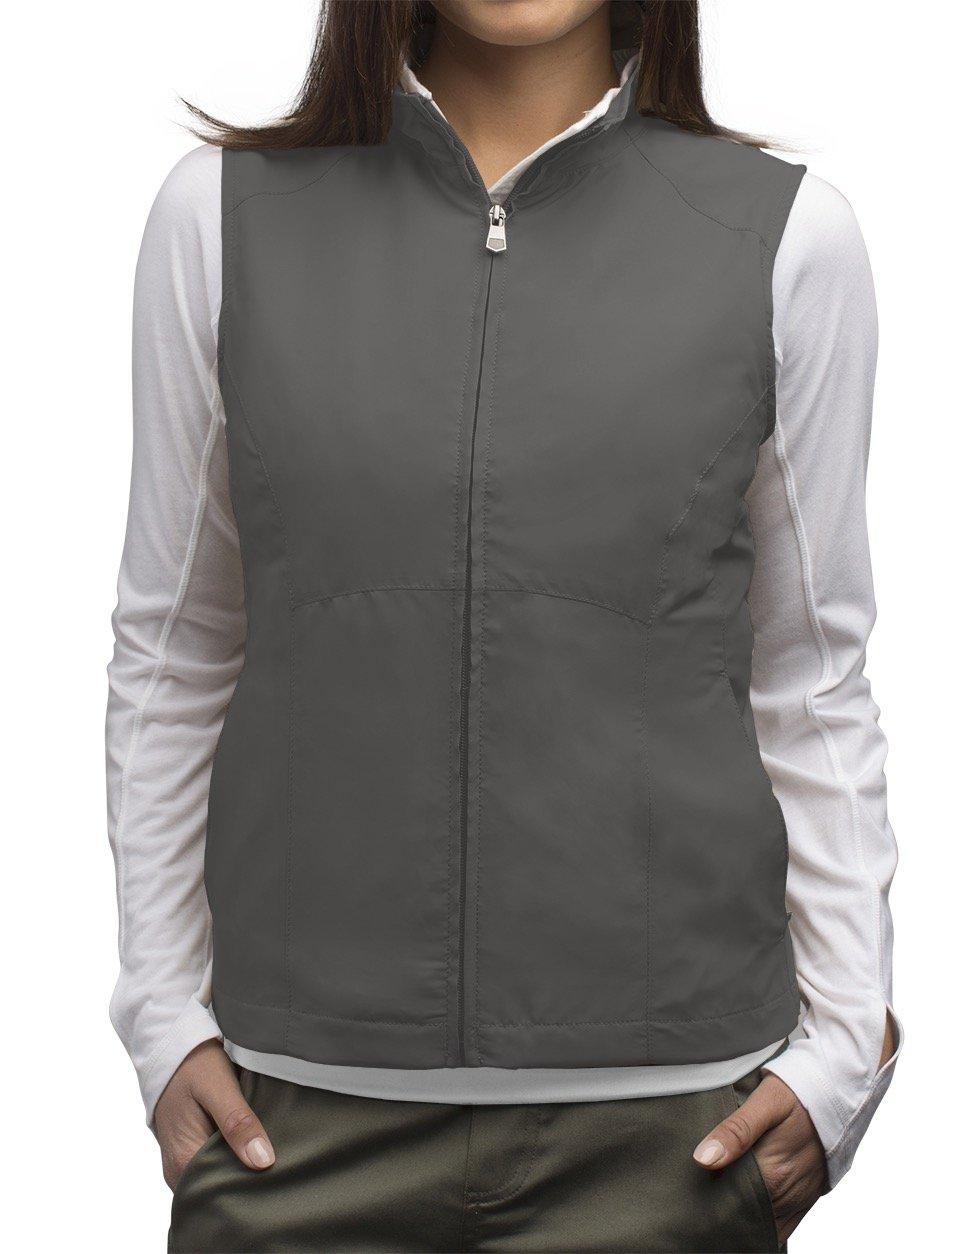 SCOTTeVEST Women's RFID Travel Vest - 18 Pockets - Travel Clothing (M2, Gray)